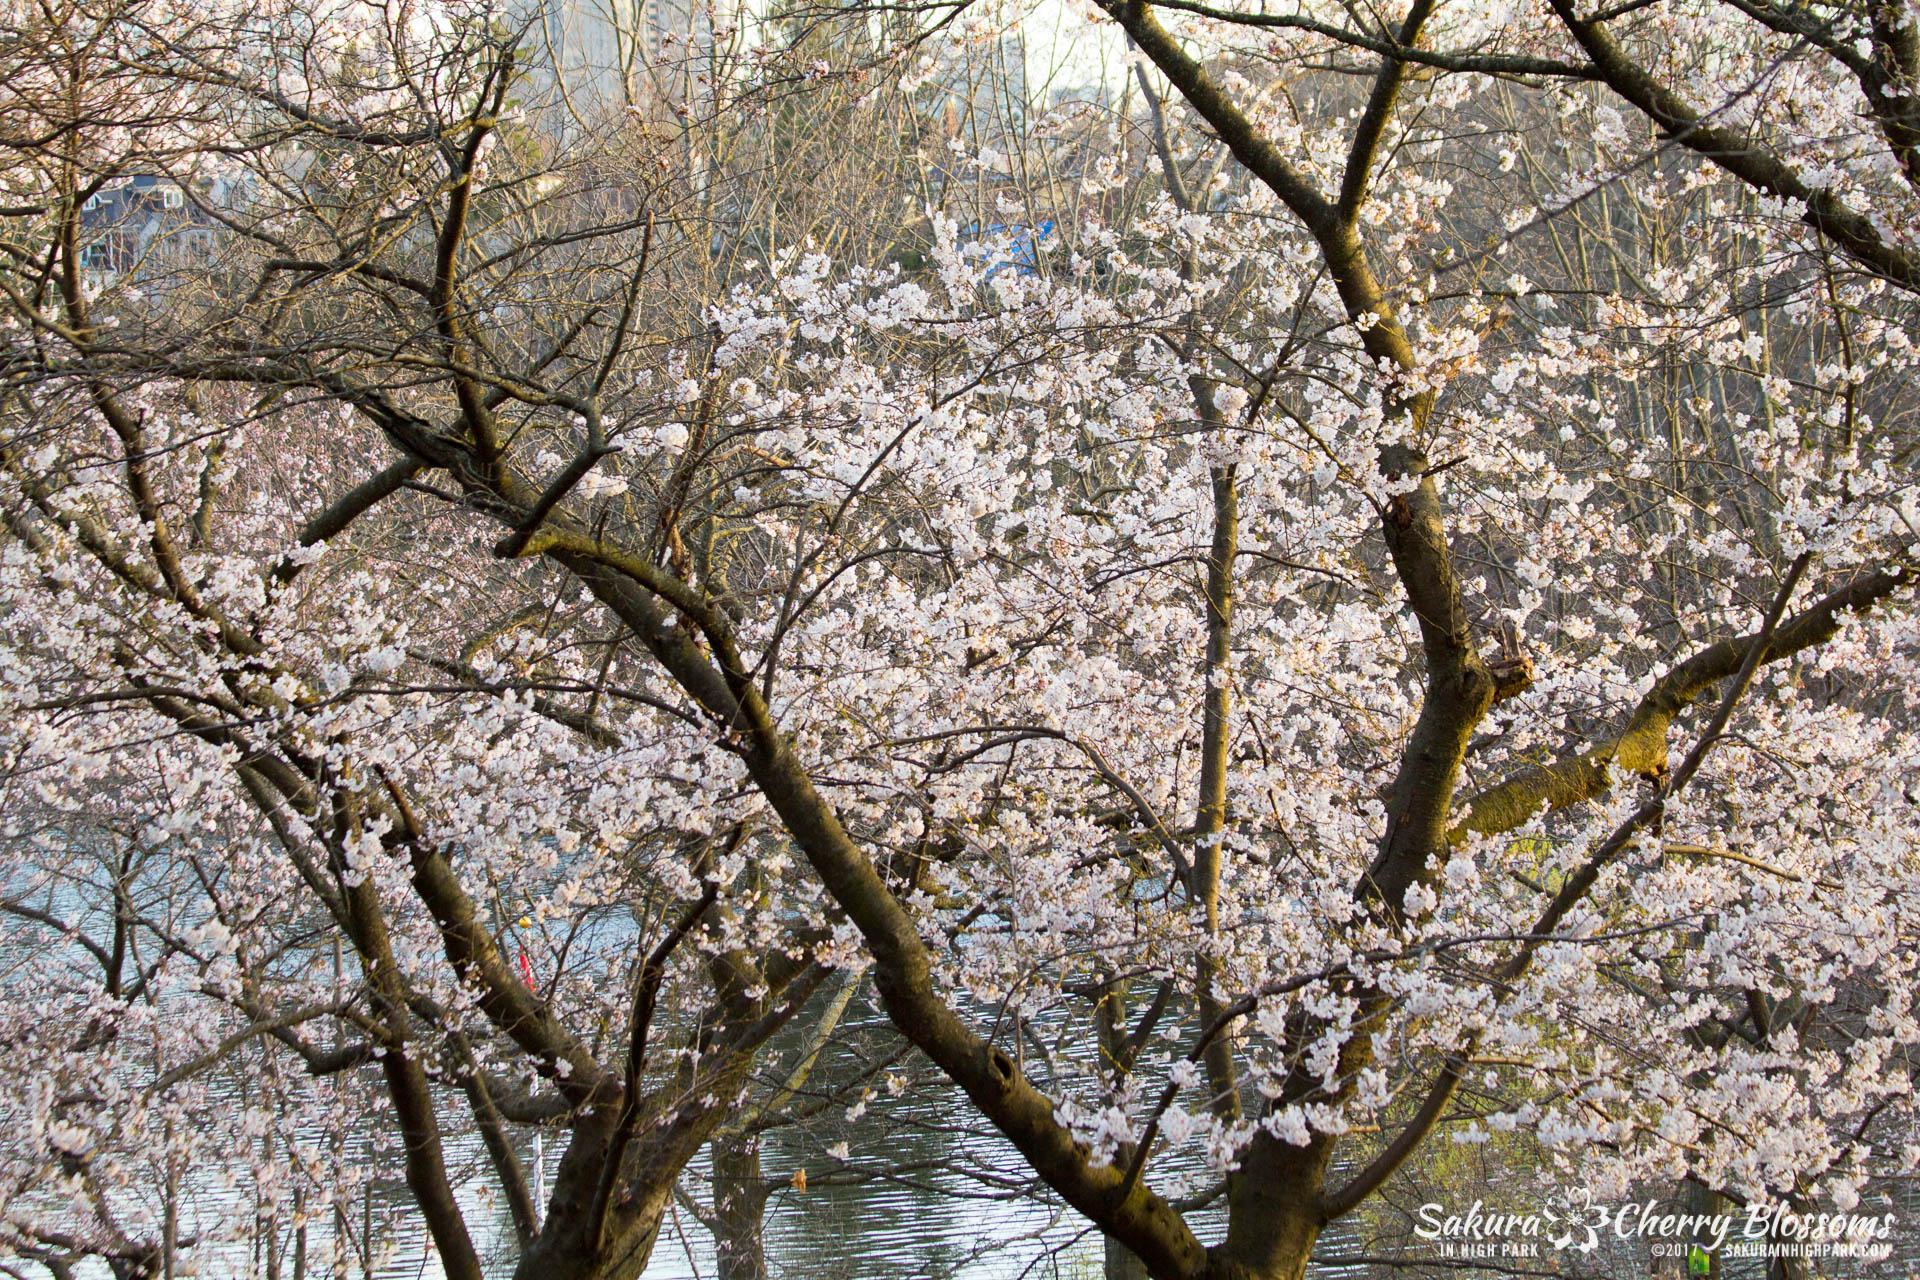 Sakura-Watch-April-24-2017-bloom-has-begun-with-more-to-come-100.jpg